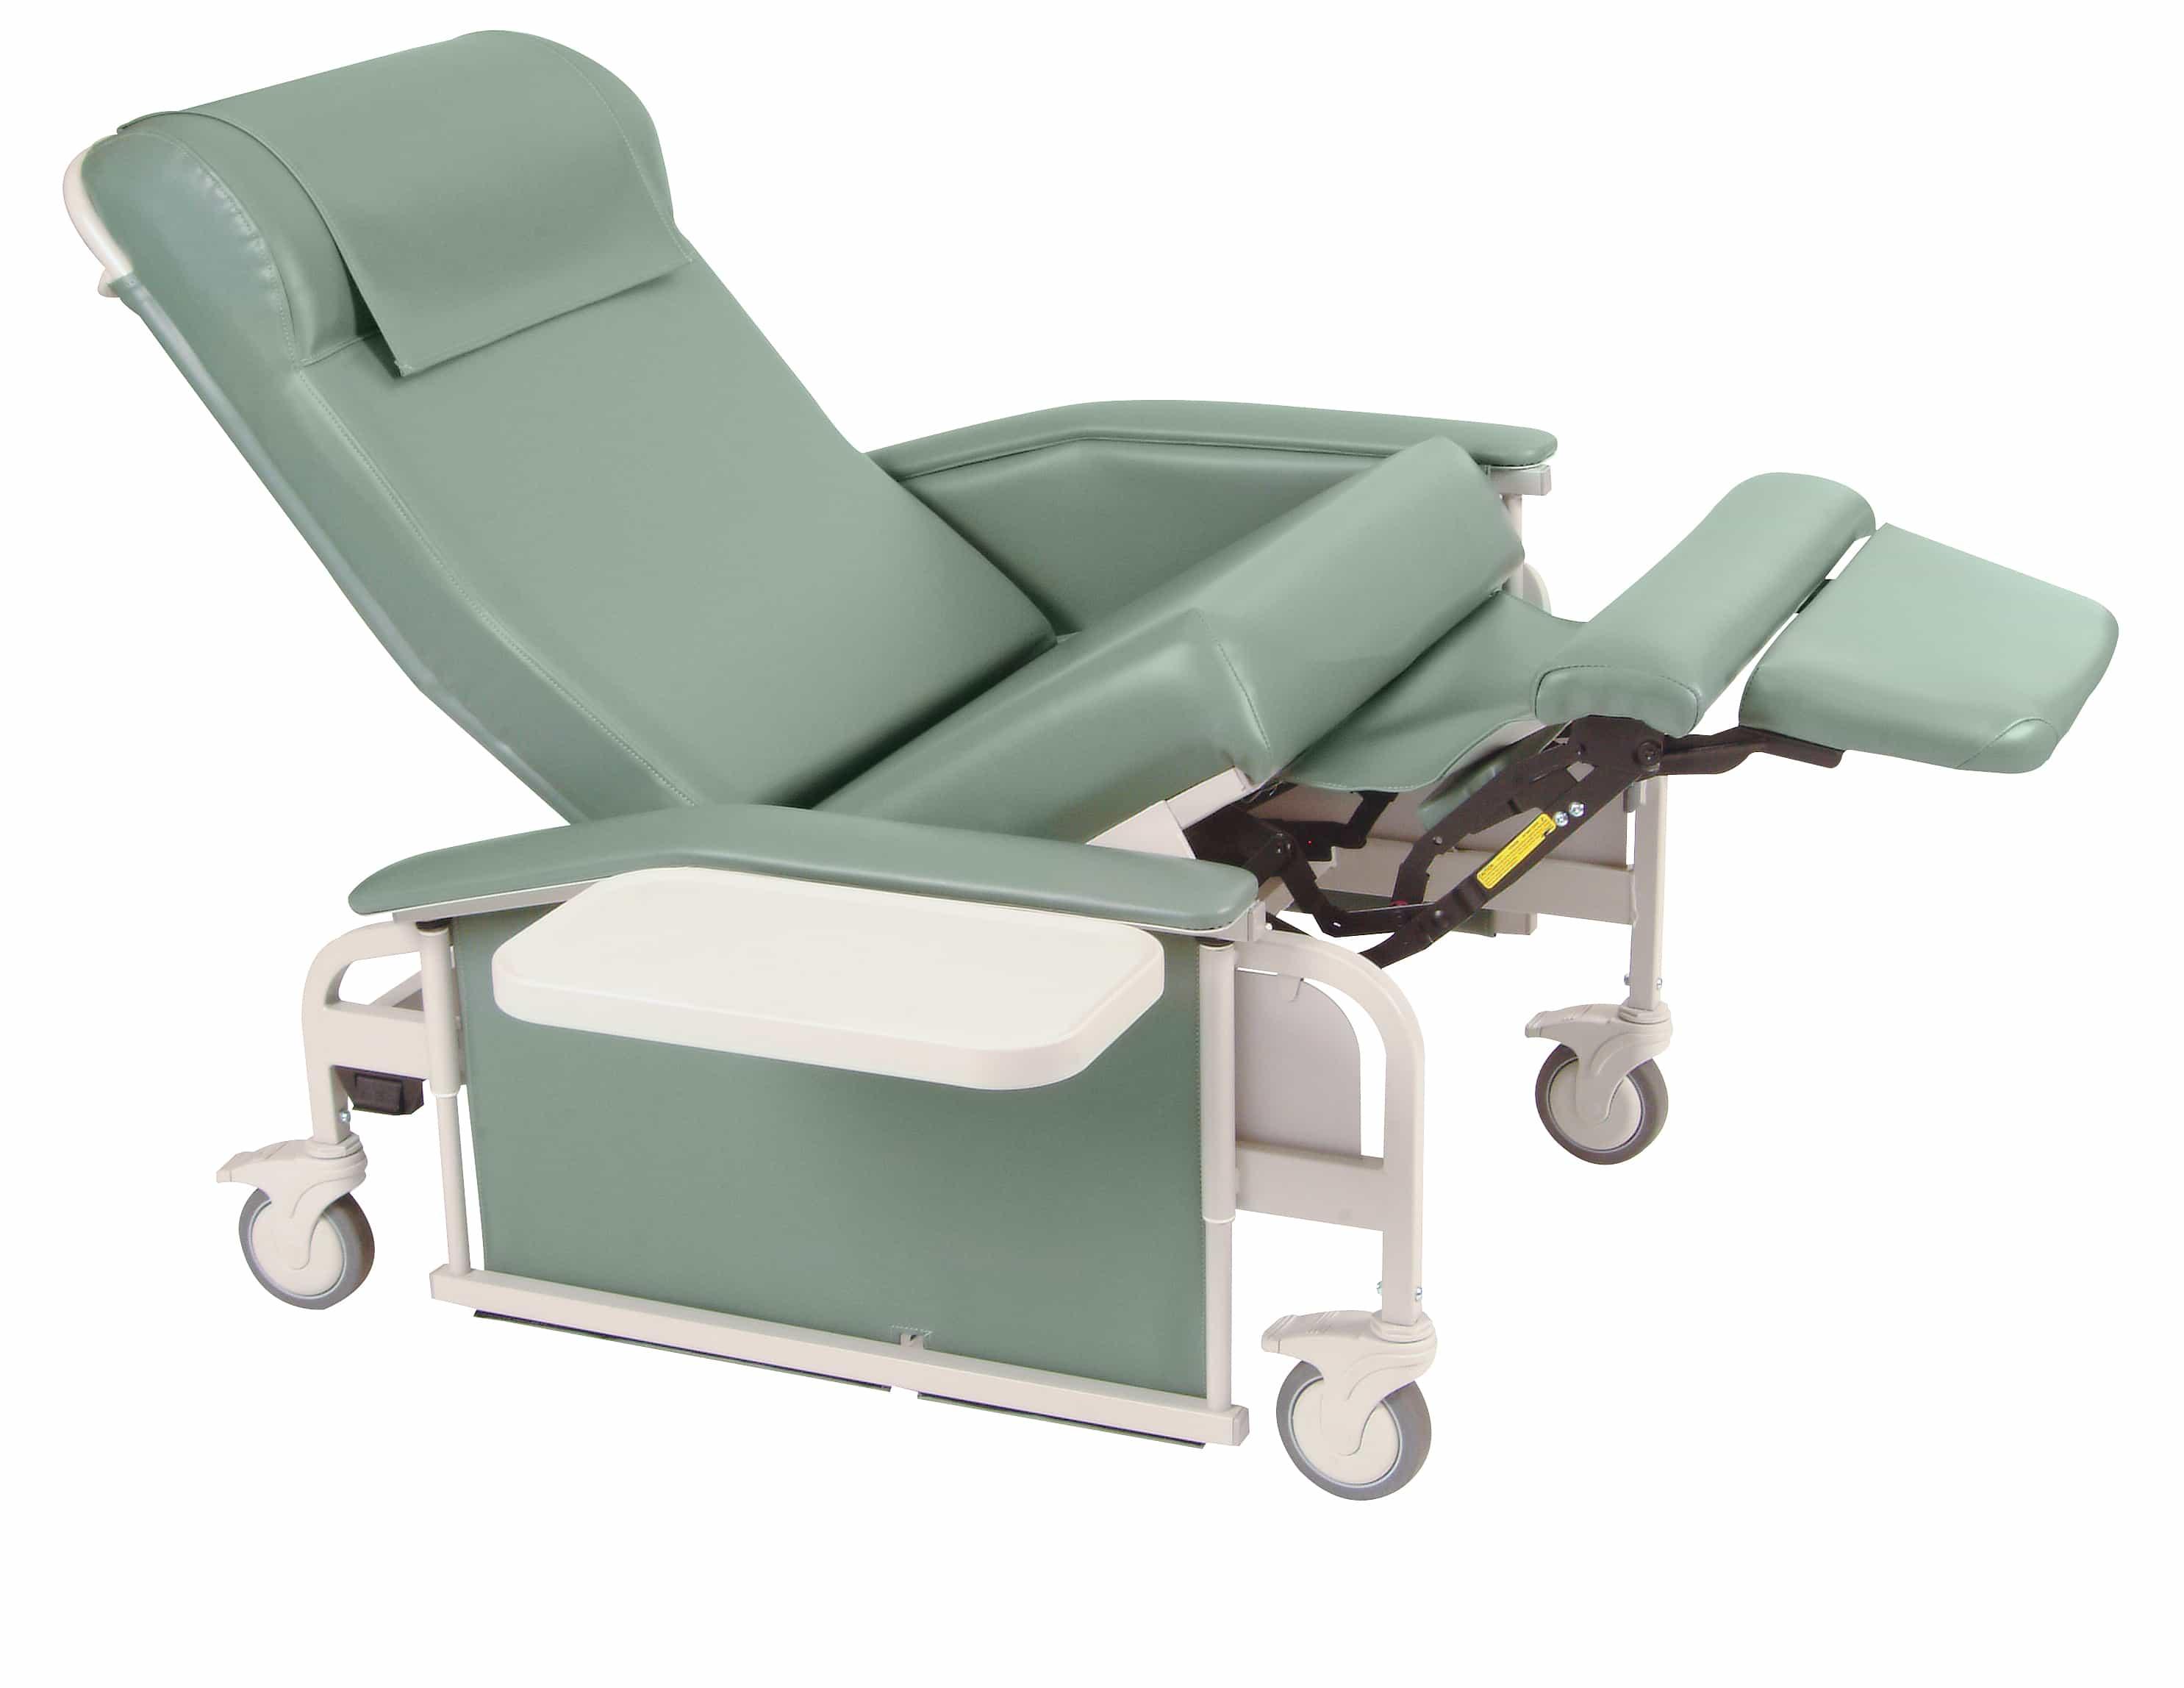 6570 / 6571 XL Drop Arm CareCliner  sc 1 st  Alderman Acres Manufacturing & Clinical Recliners u0026 Chairs - Trendelenburg | Alderman Acres ... islam-shia.org